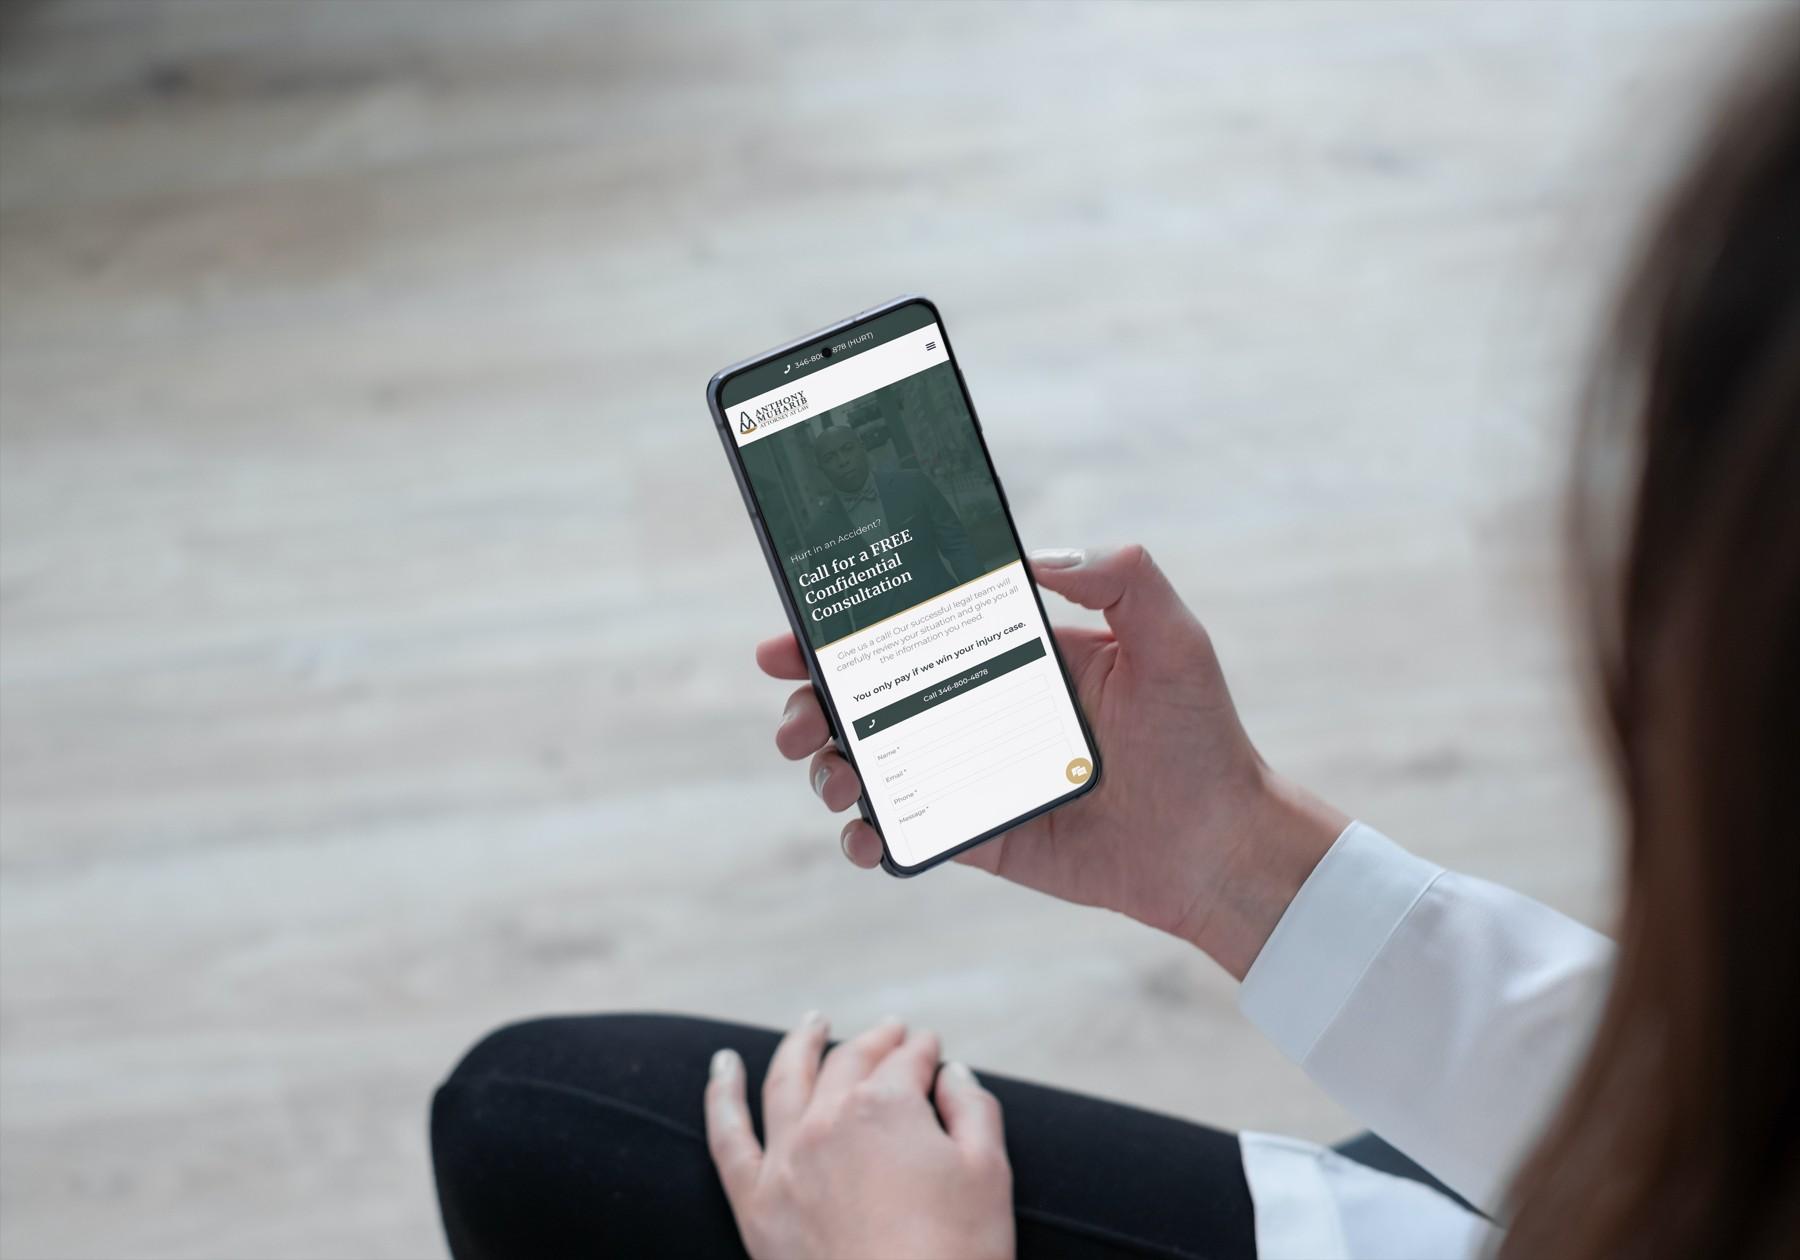 Muharib Law Website Design - Smartphone